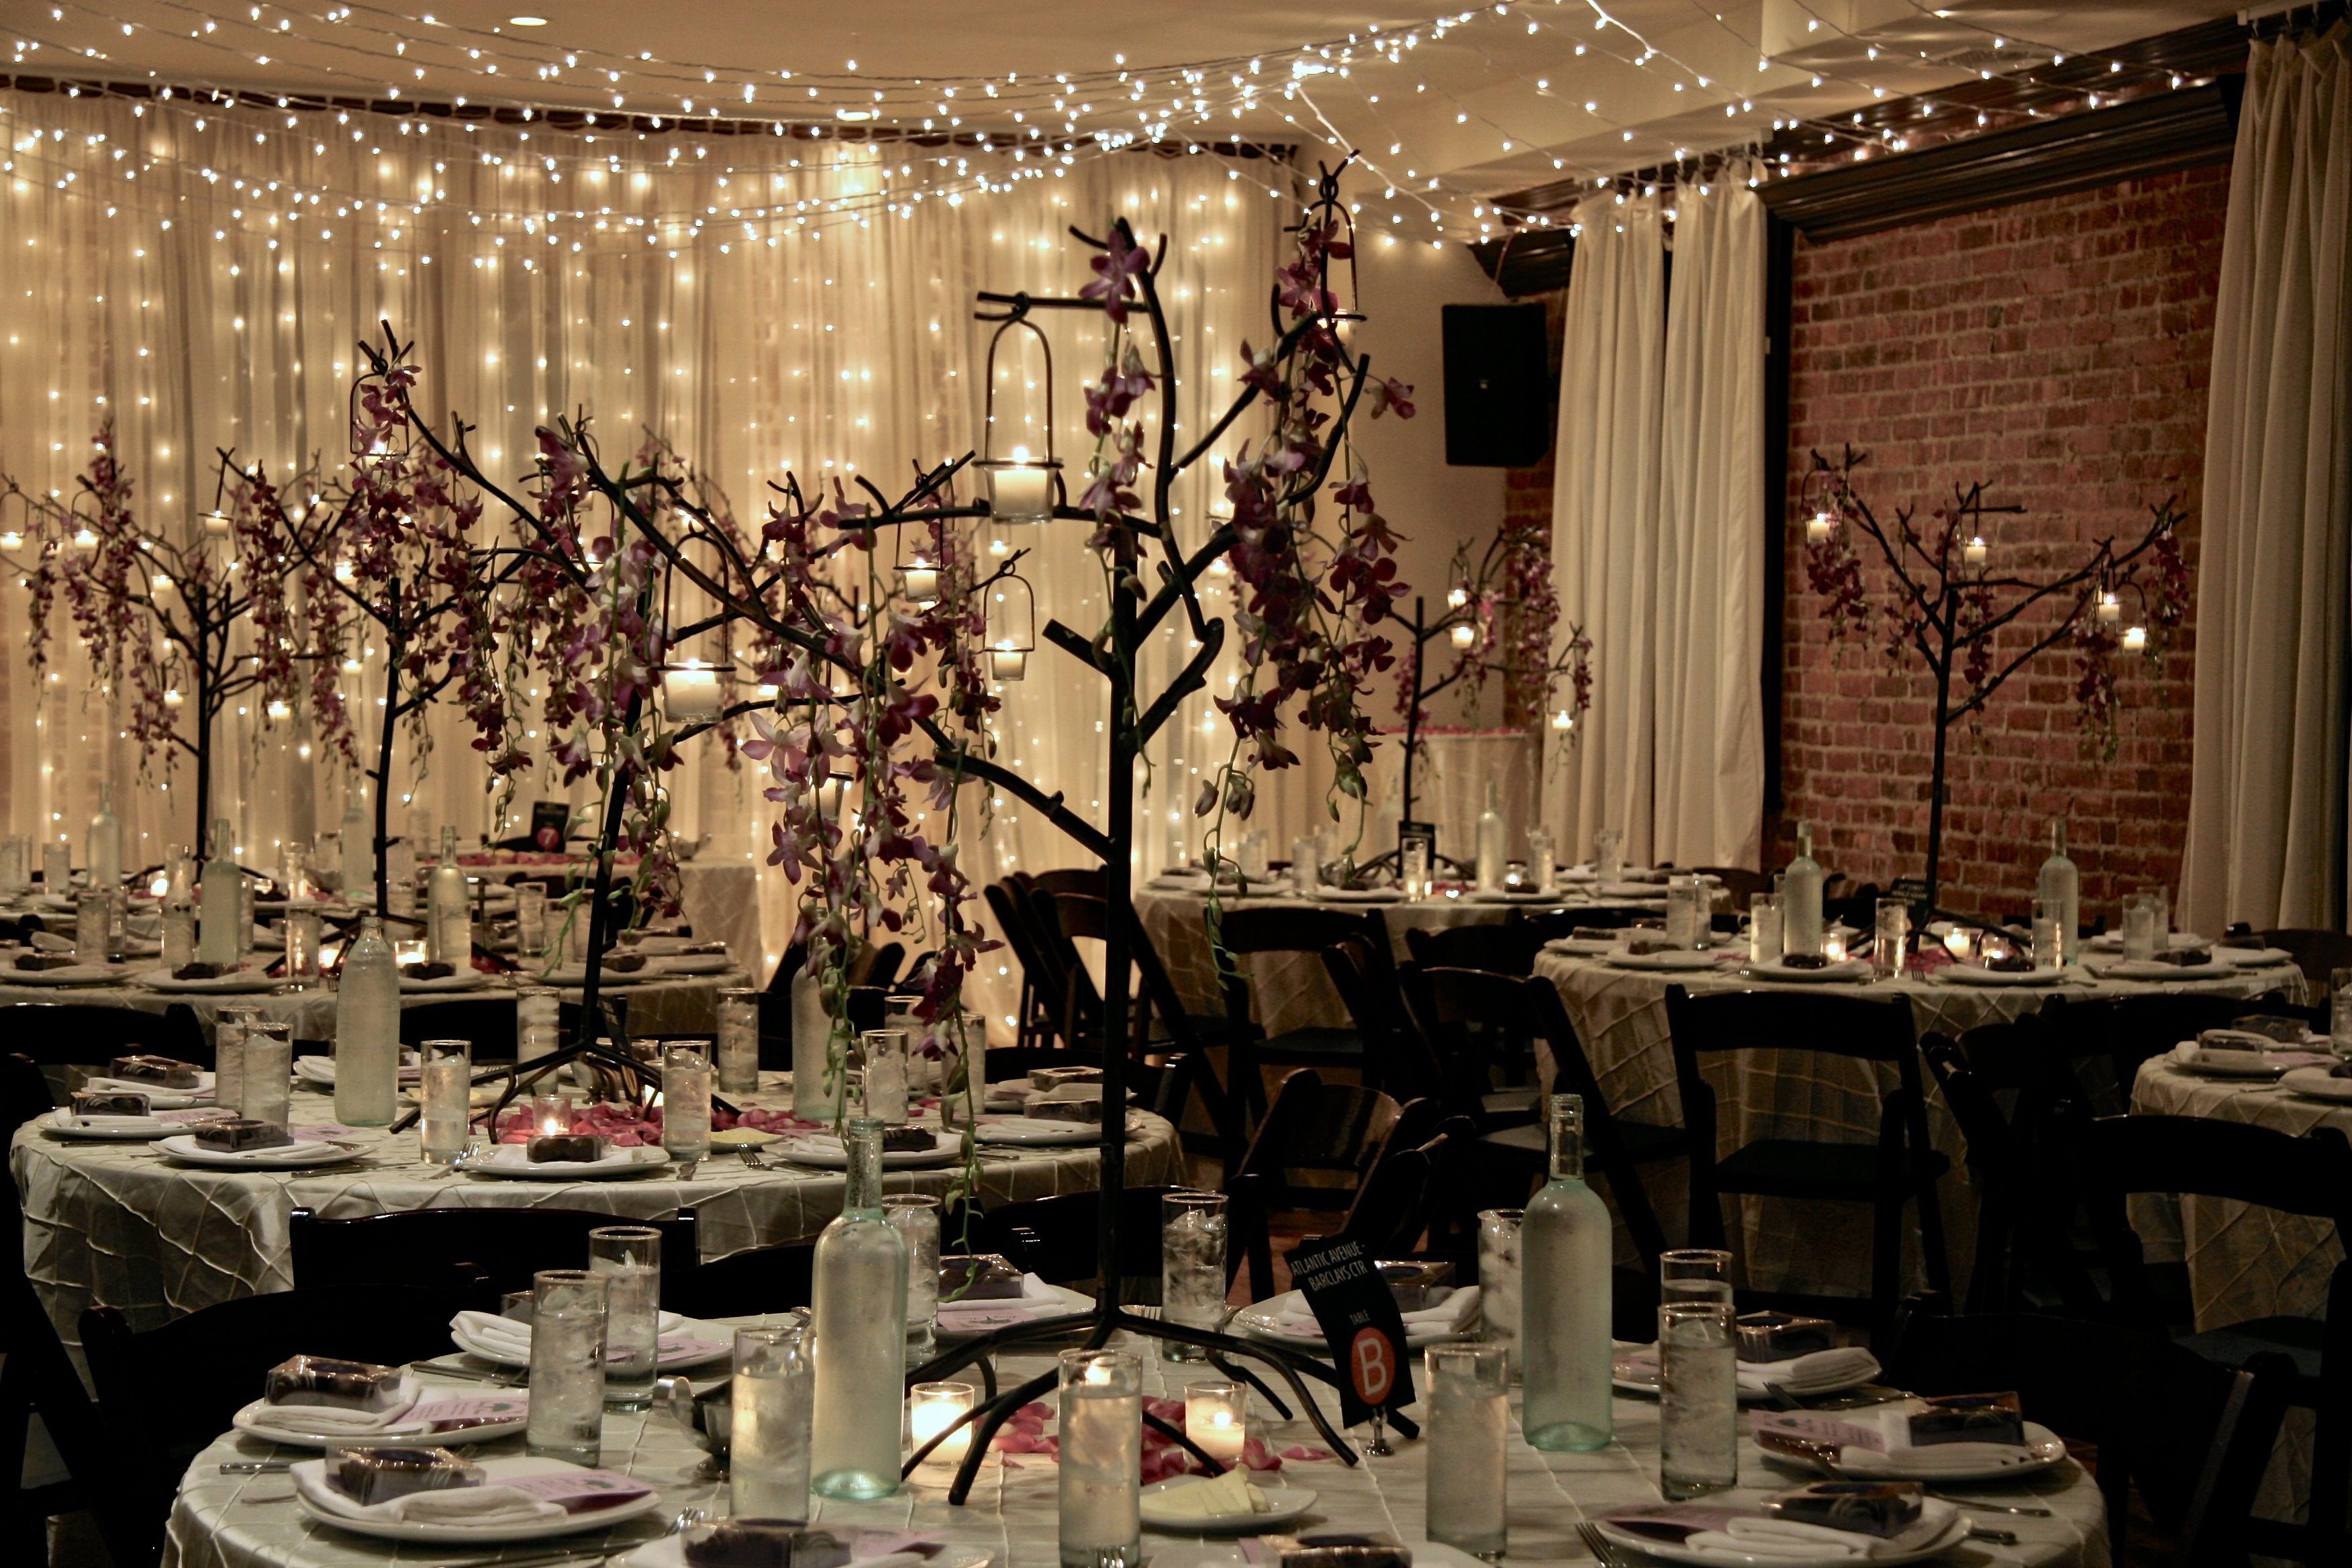 Brooklyn wedding venue orchid trees deity nyc brooklynwedding brooklyn wedding venue orchid trees deity nyc brooklynwedding brooklynweddingvenue bkweddingexpo junglespirit Image collections